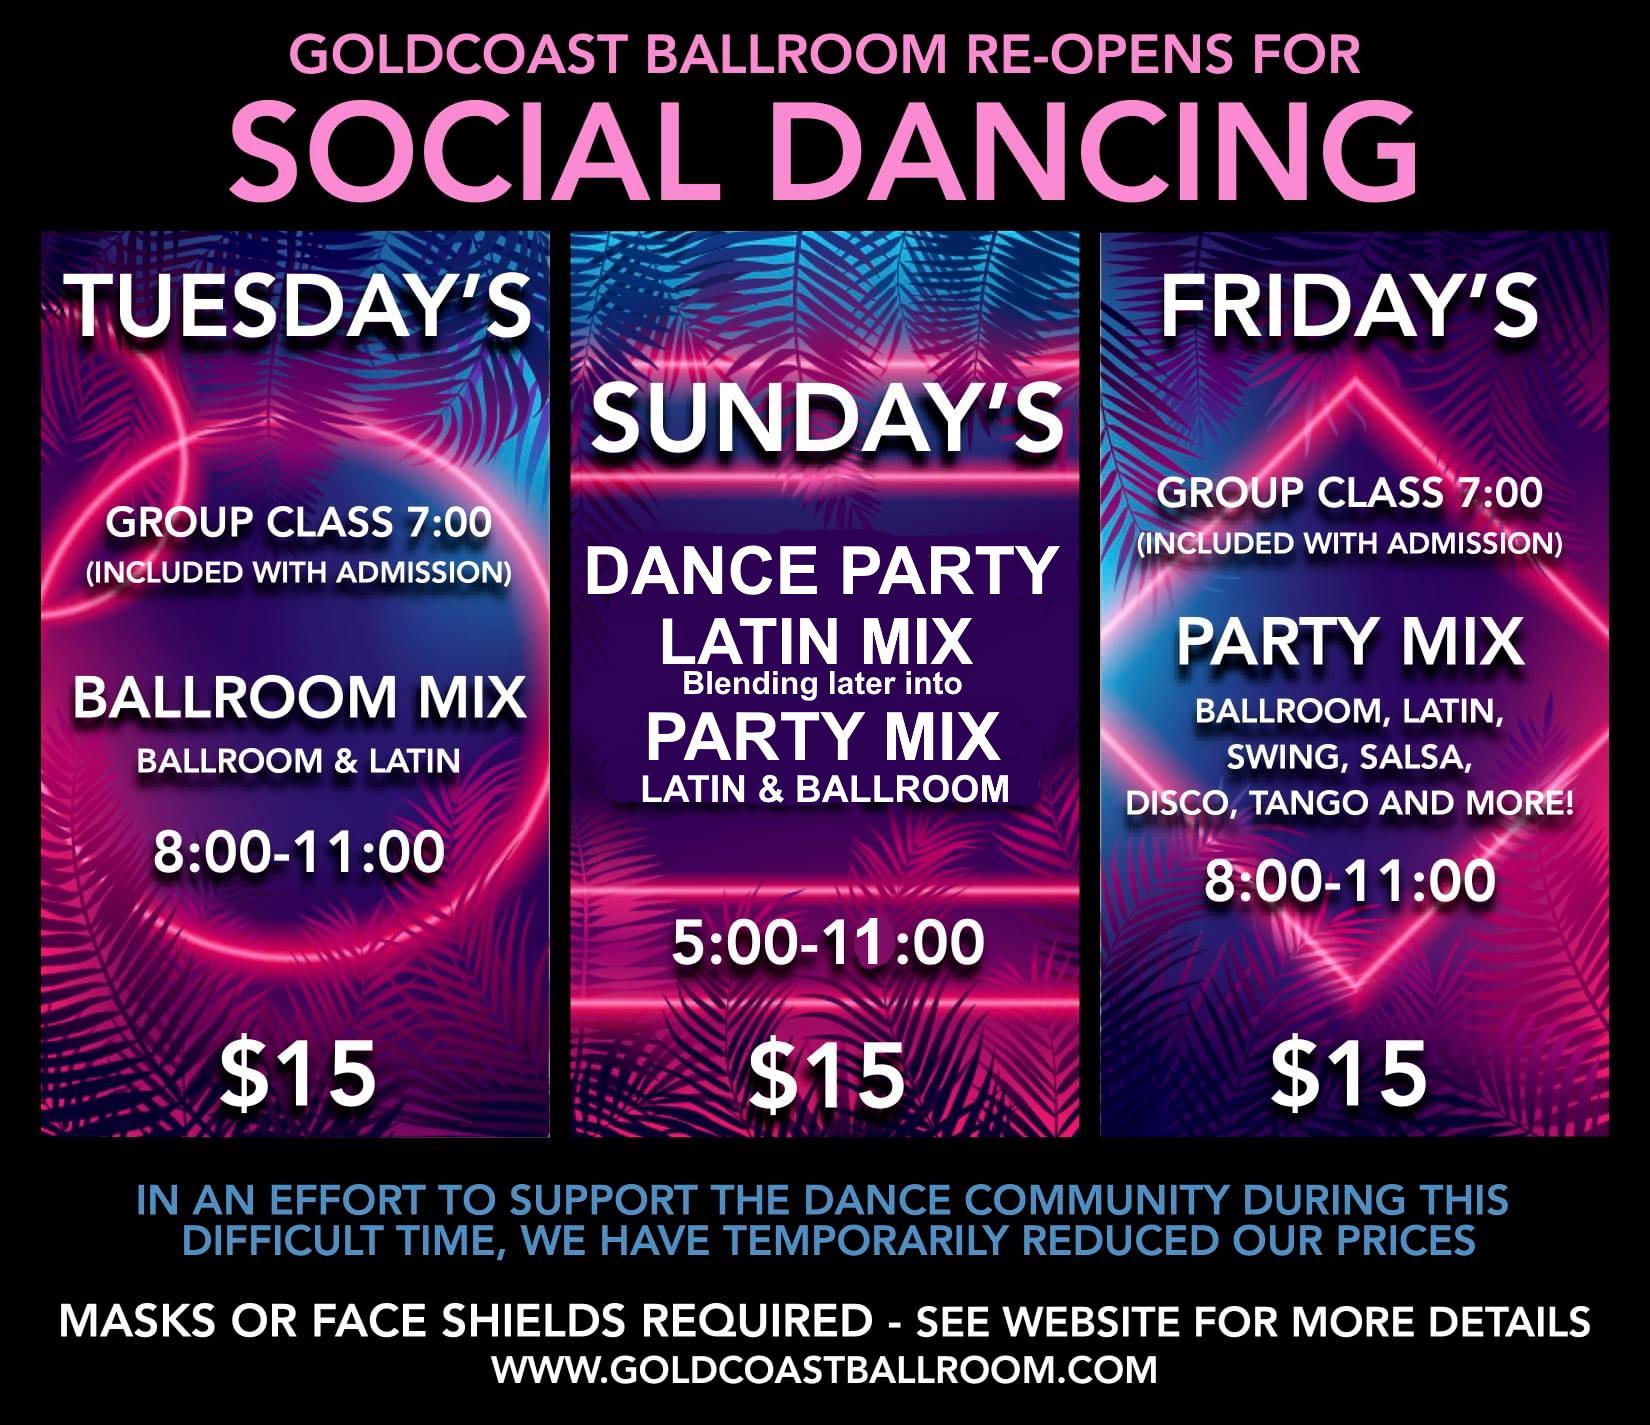 Social Dancing at Goldcoate Ballroom - Sundays, Tuesdays & Fridays!